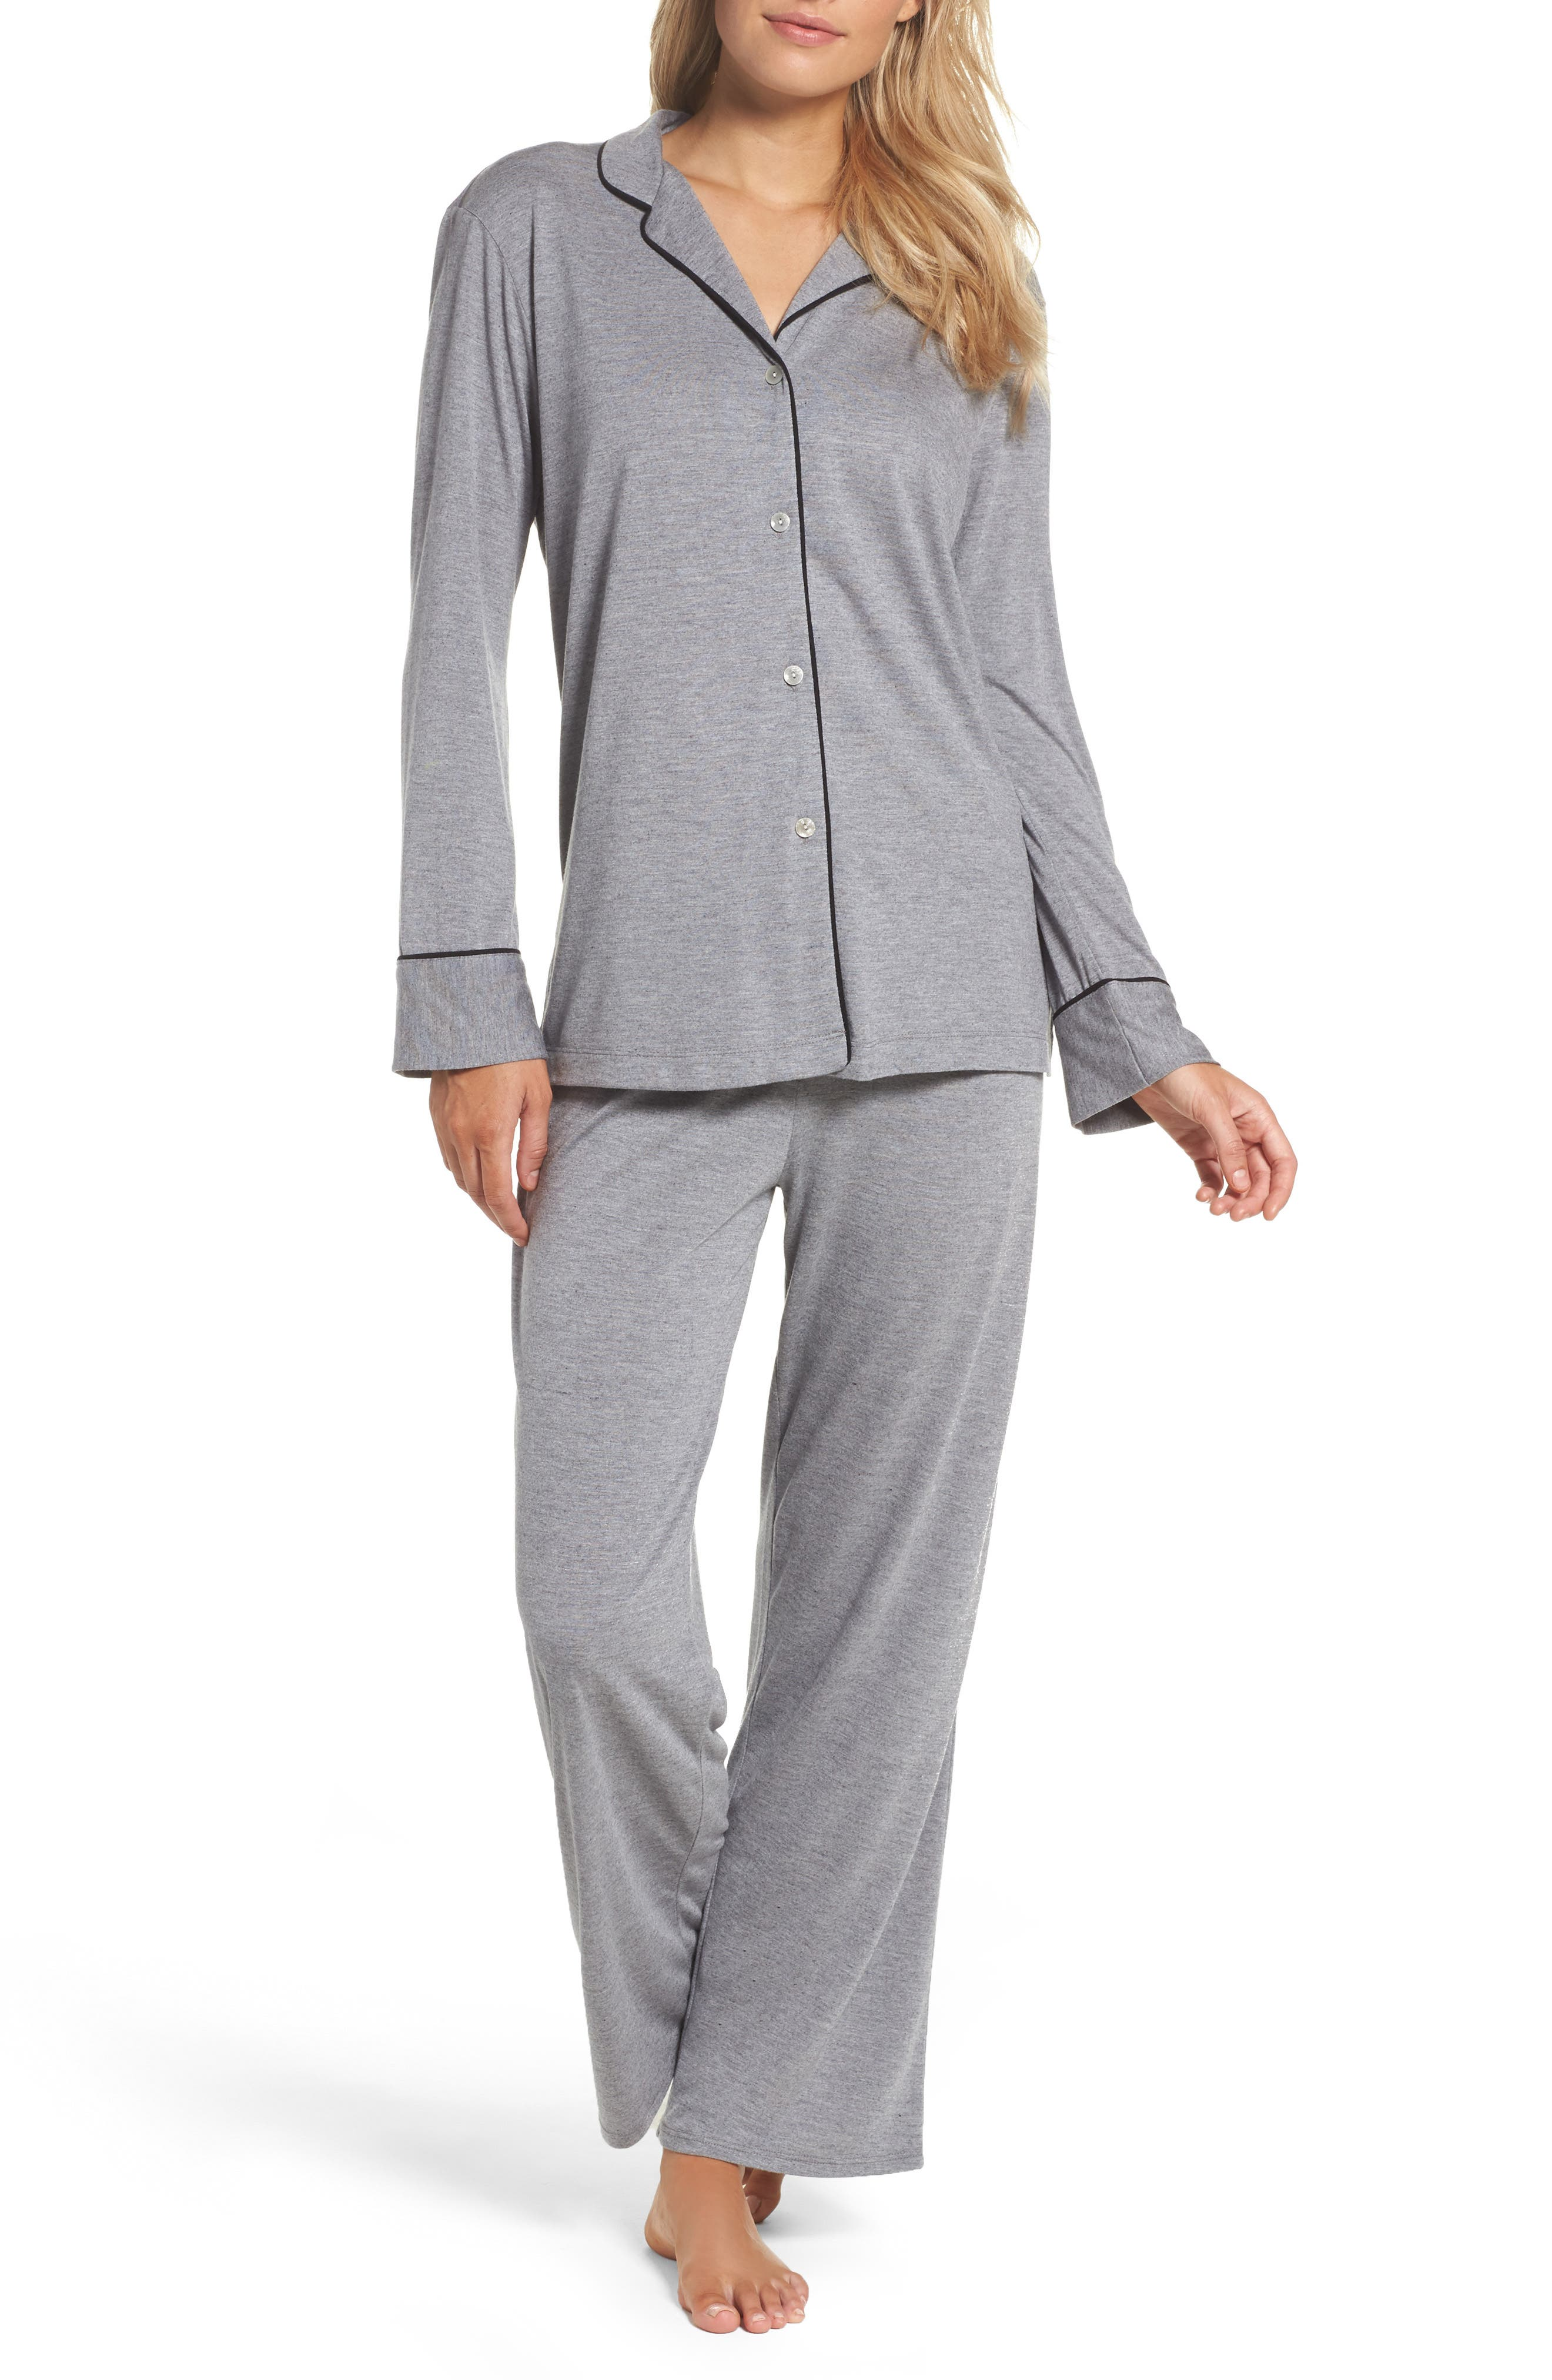 Alternate Image 1 Selected - Natori Shangri La Notch Collar Pajamas